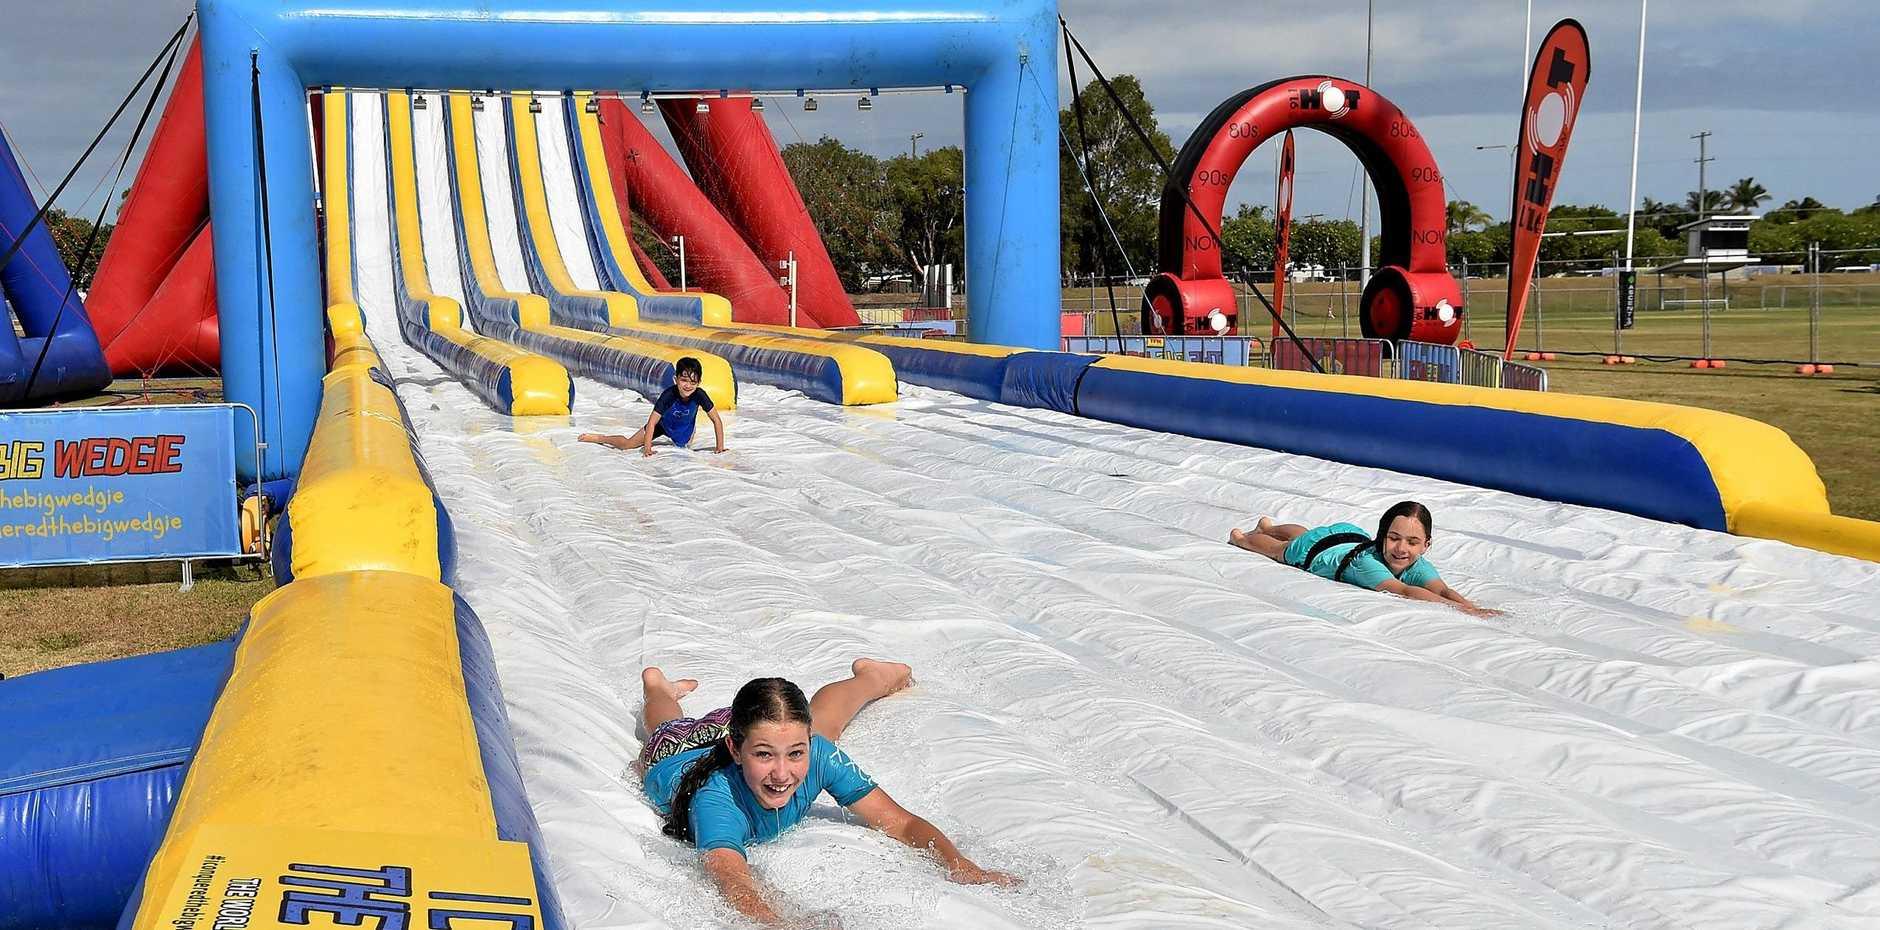 SLIDING FUN: The Big Wedgie has arrived at the Sunshine Coast Sports Precinct, Kawana, ready for the school holidays.